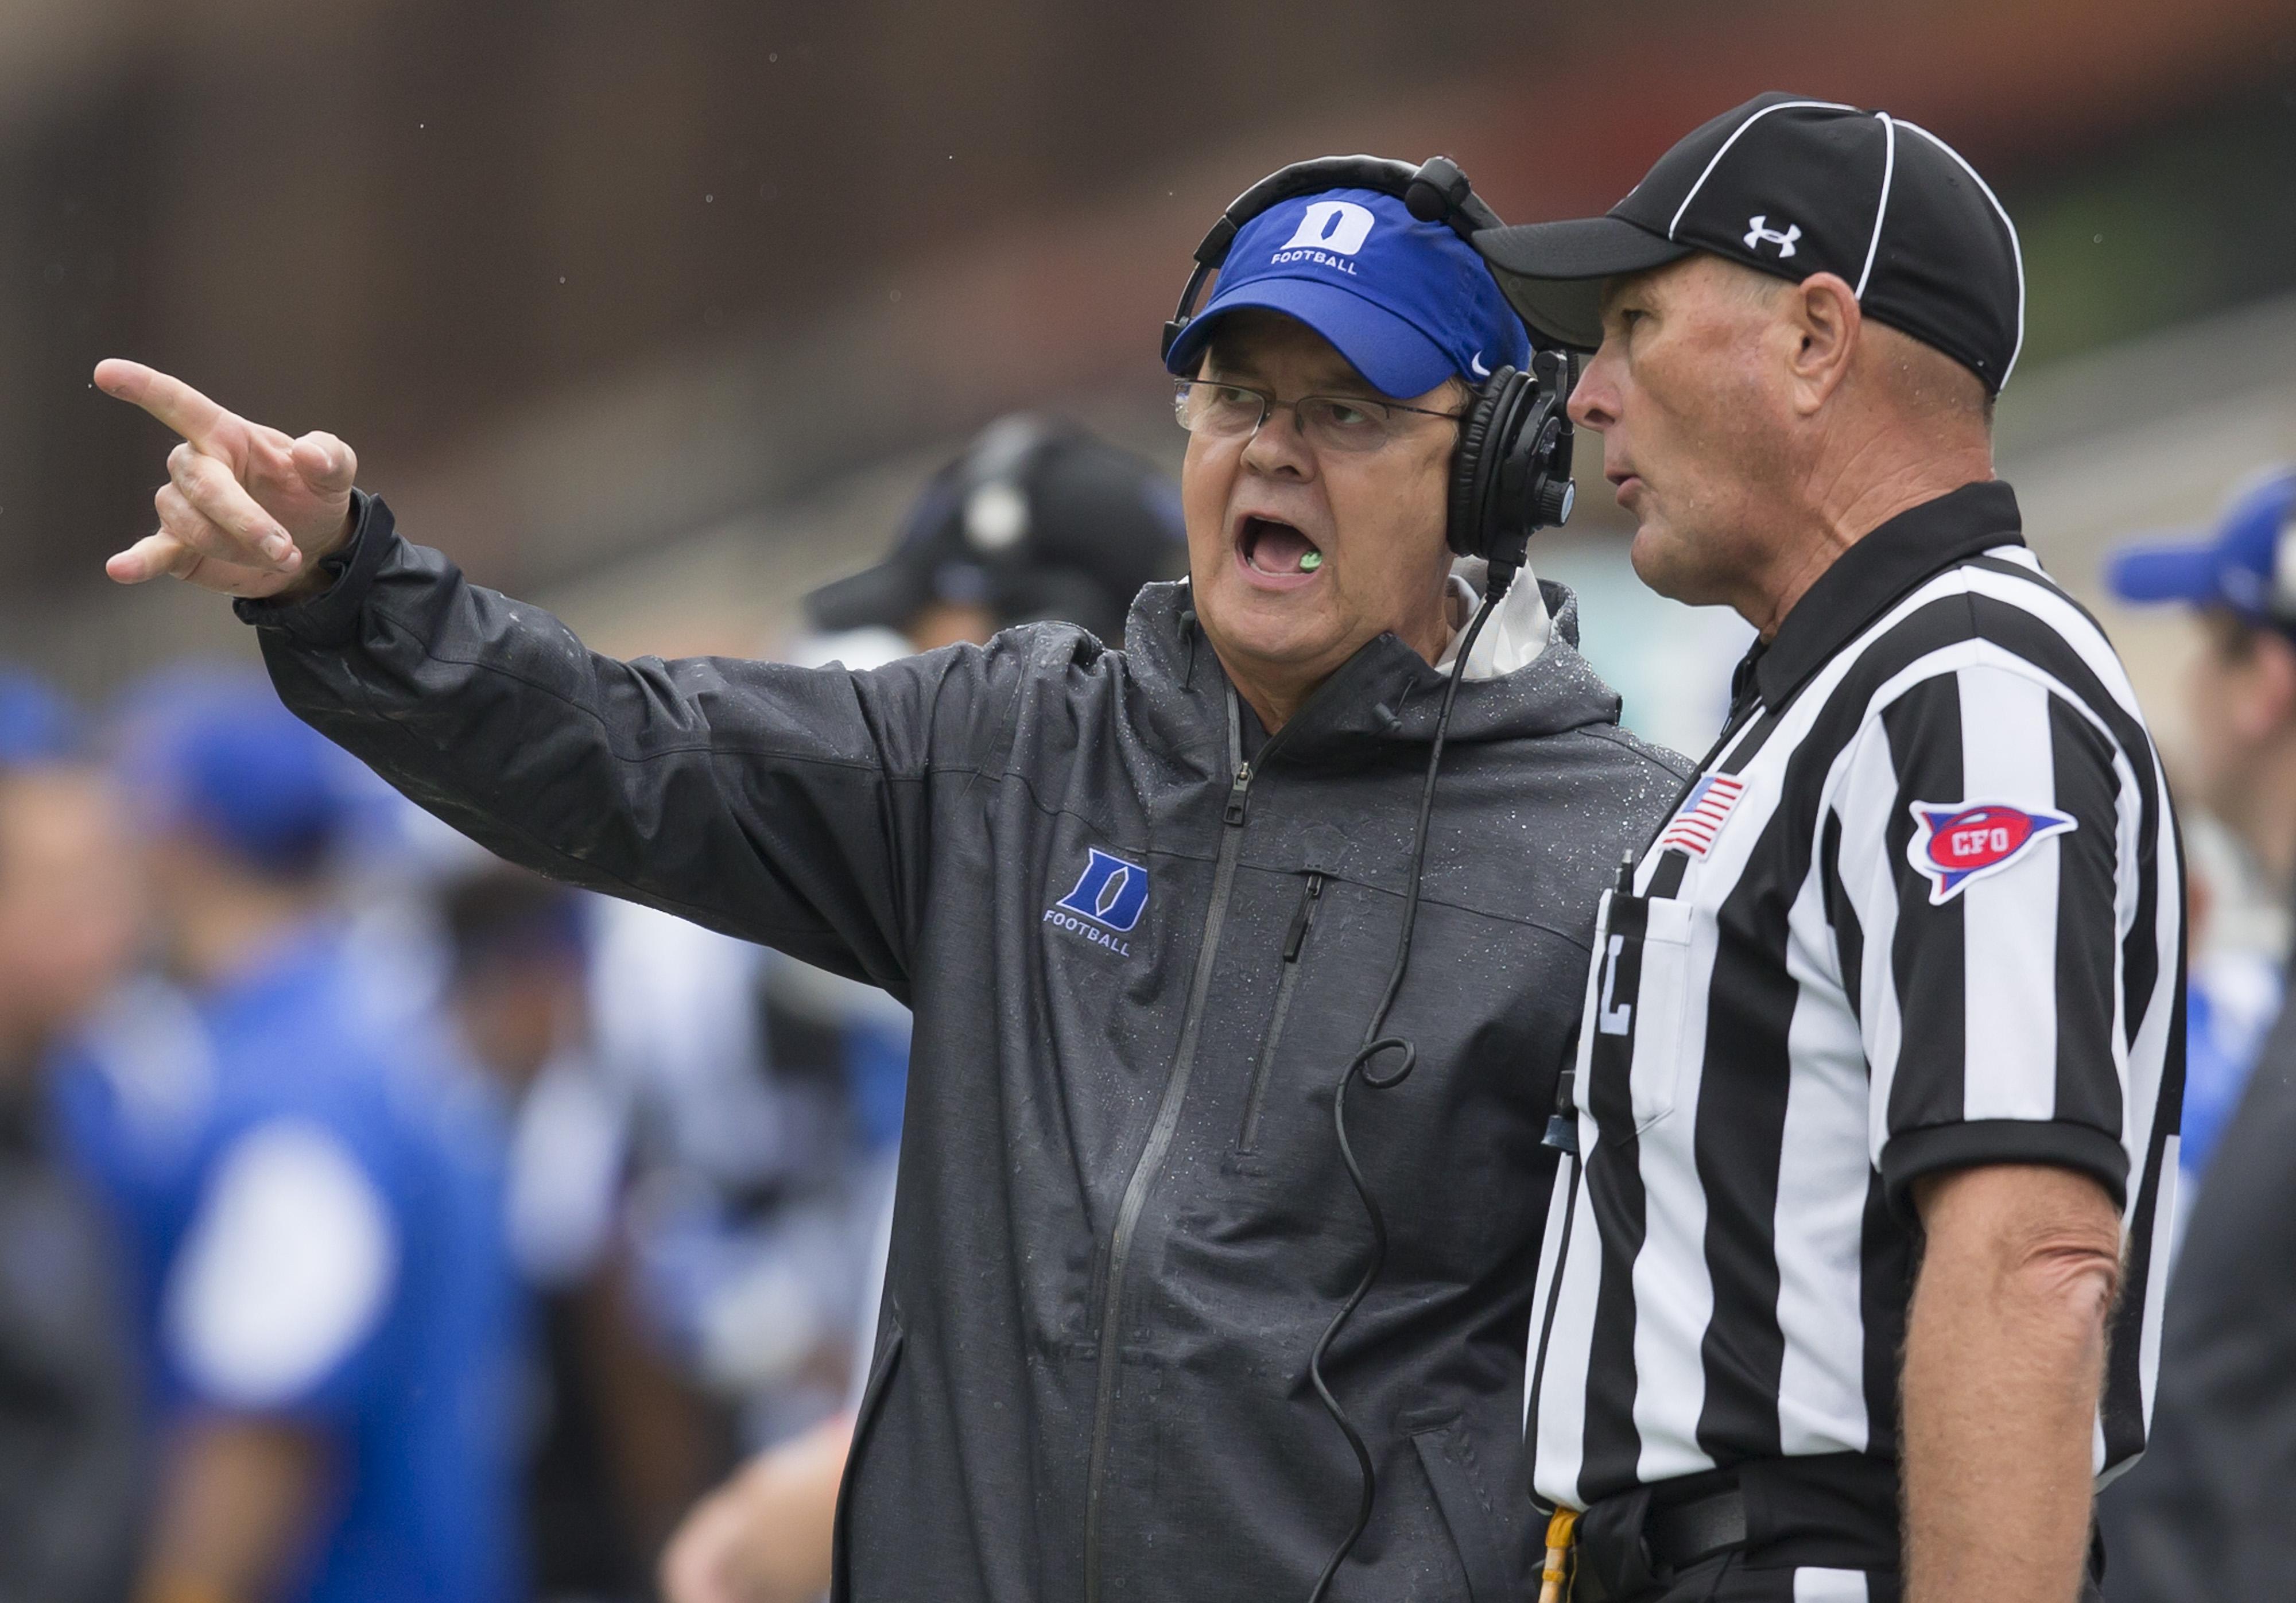 Duke head coach David Cutcliffe, left, talks with a linesman during the second half of an NCAA college football game against Georgia Tech in Durham, N.C., Saturday, Sept. 26, 2015. (AP Photo/Rob Brown)